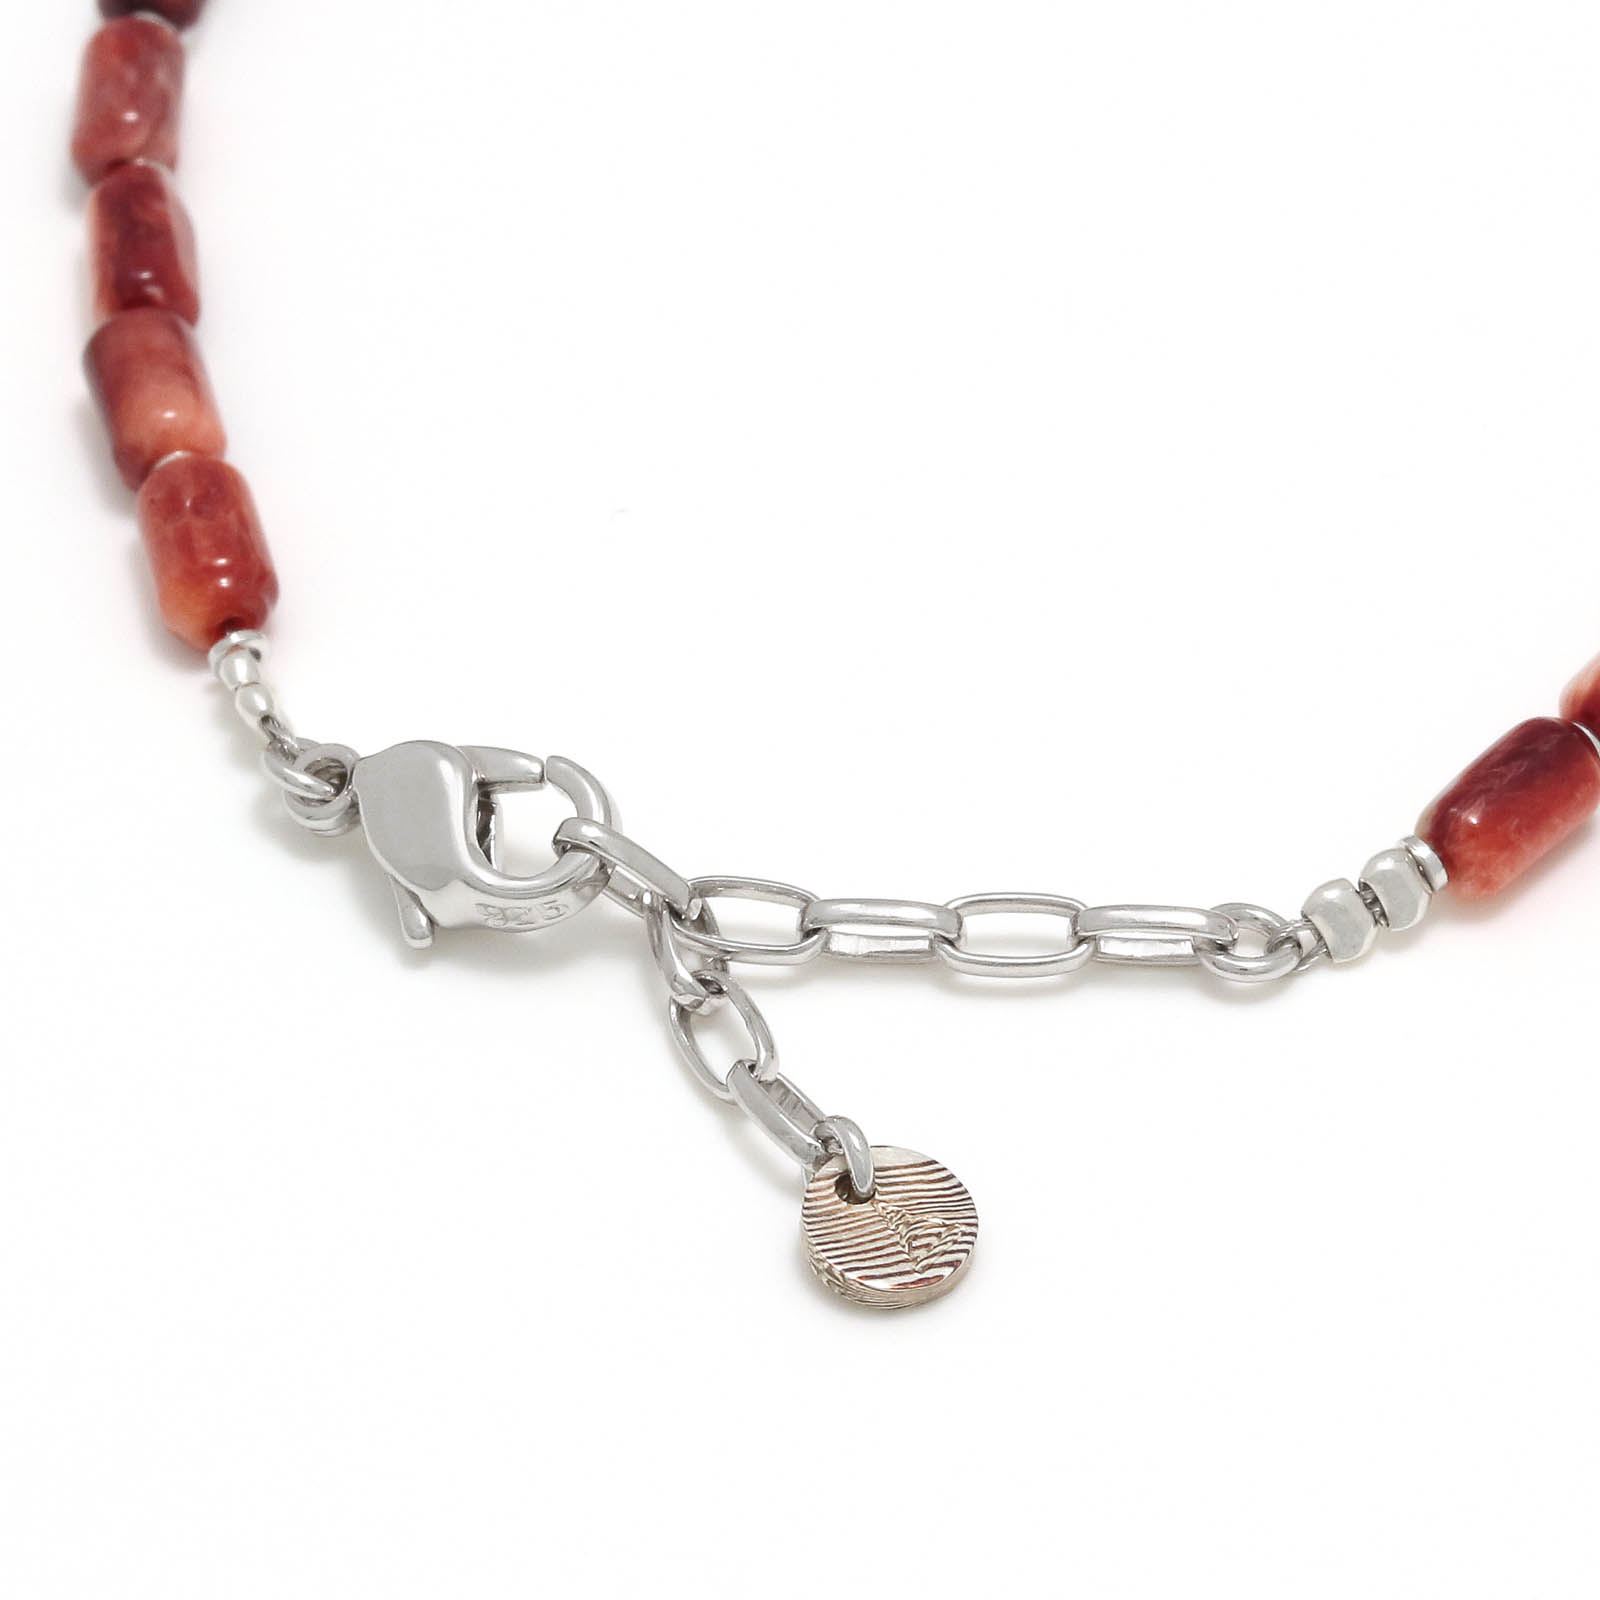 Tube Beads Bracelet - Spiny oyster shell